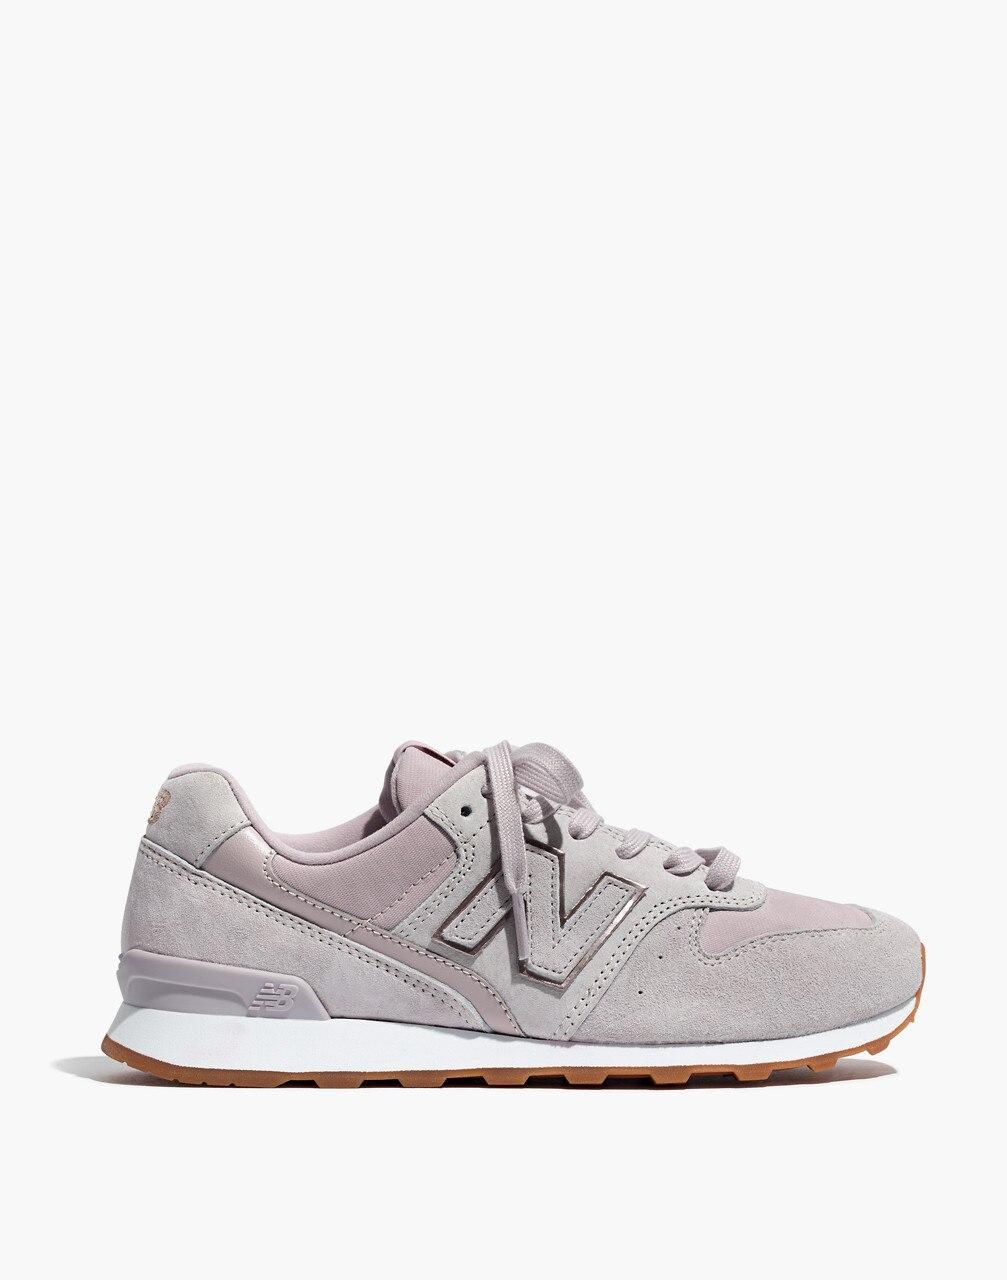 New Balance® 696 Runner Sneakers